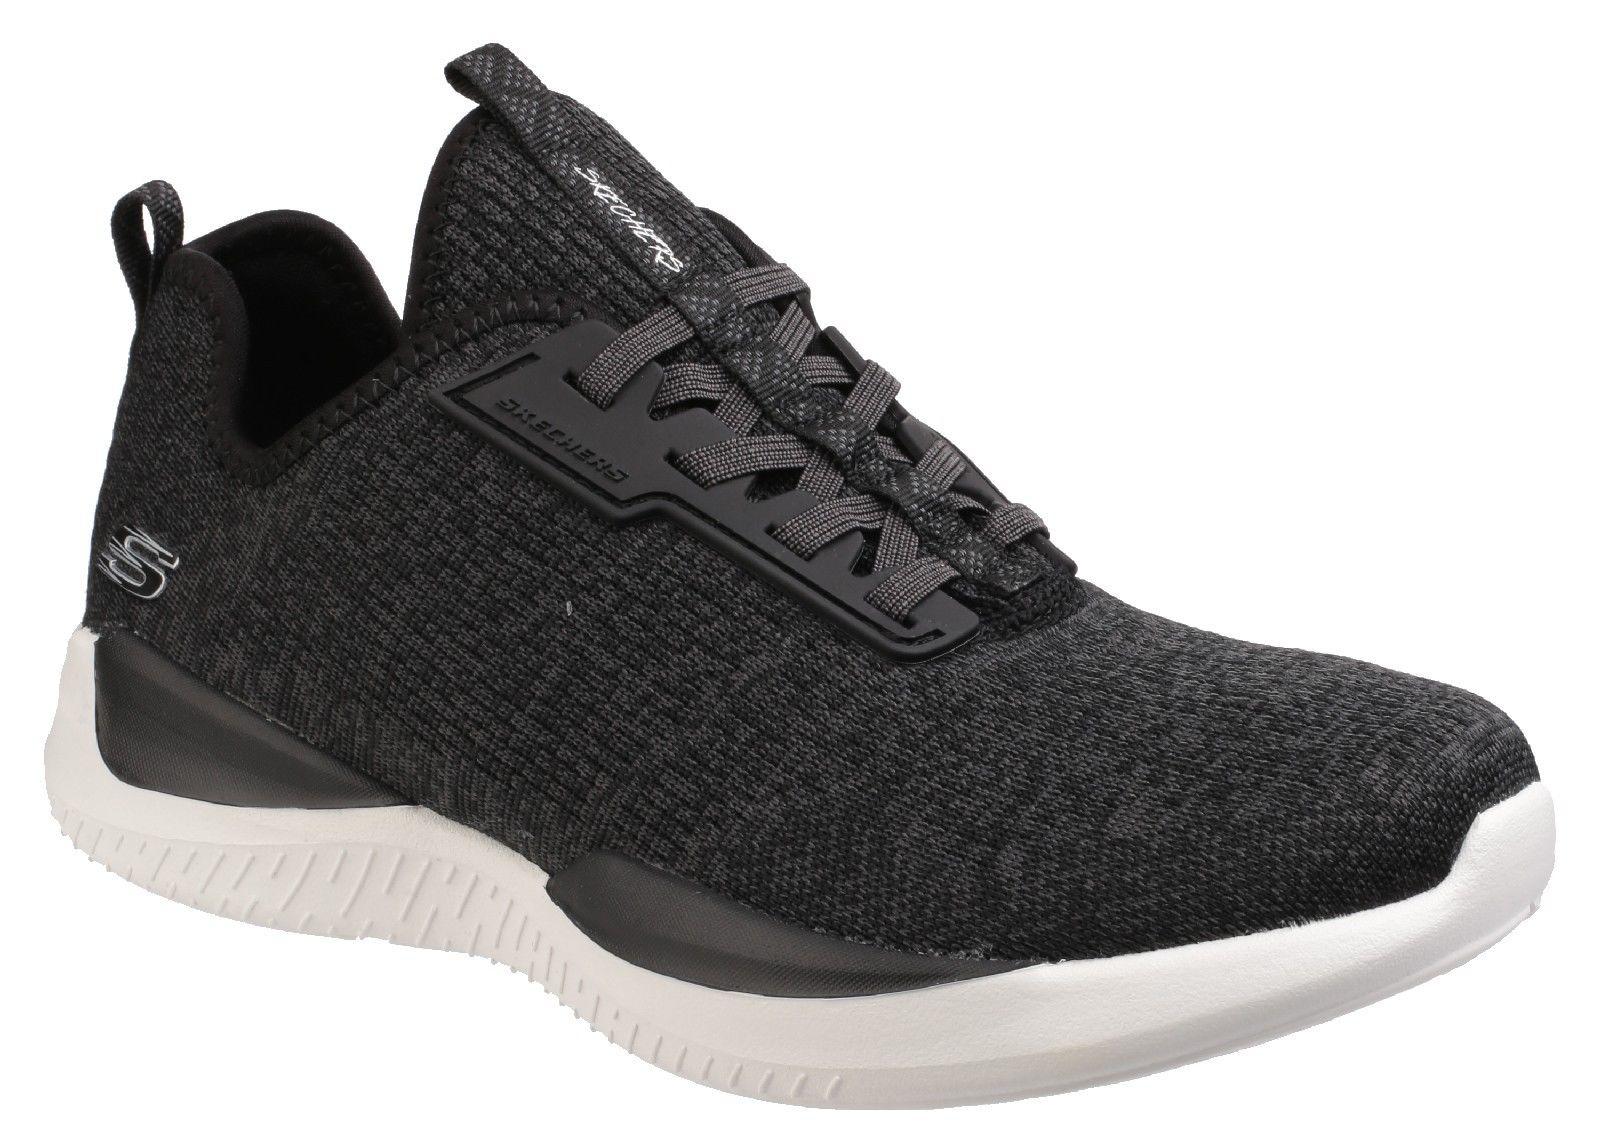 Skechers SK12456 Matrixx schwarz ladies shoe slip on comfort trainer shoe ladies Größe 3-8 2666d3